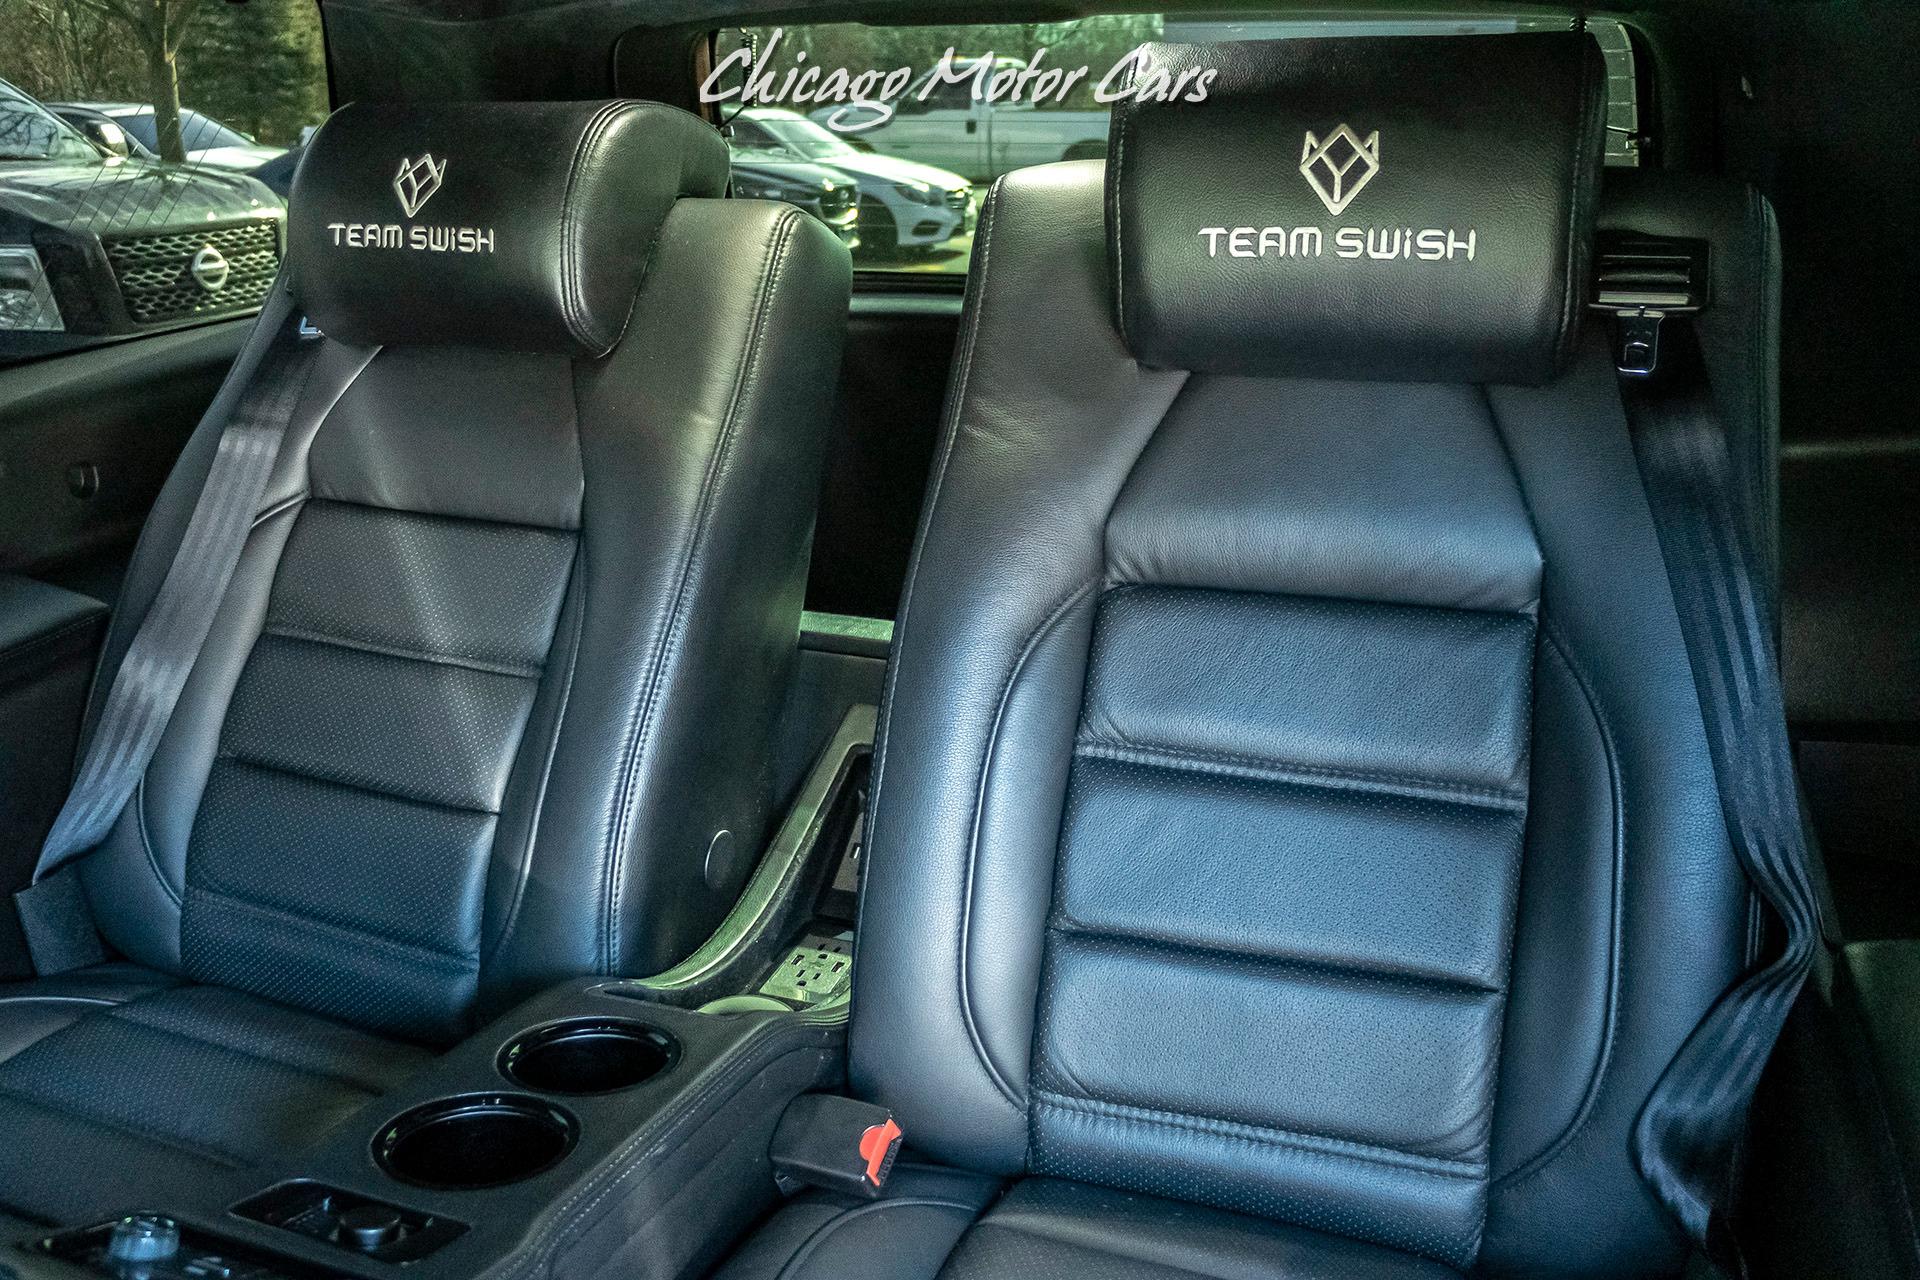 Used-2017-GMC-Yukon-XL-AWD-Denali-Custom-Executive-Build-for-Professional-Athletes